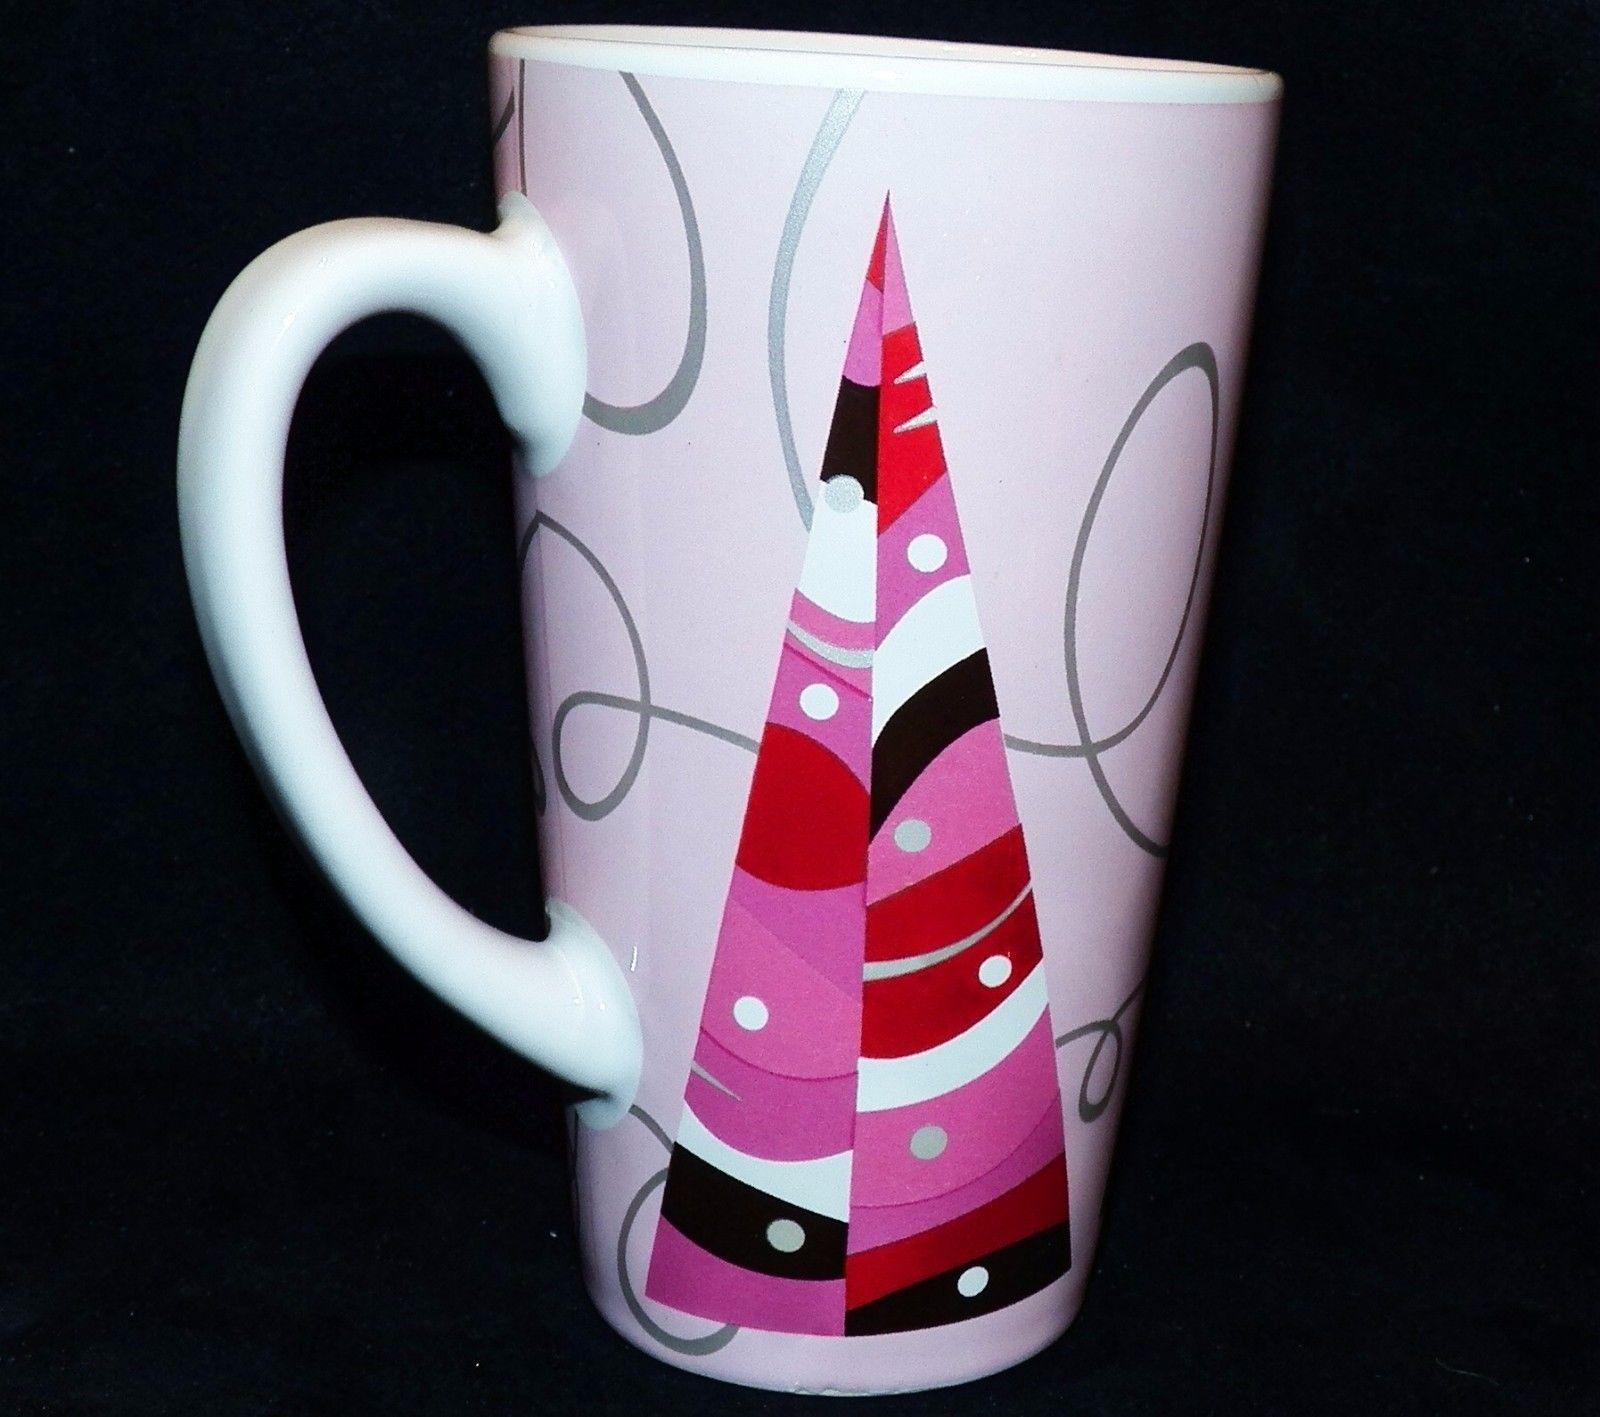 2004 Starbucks Tall Pink Silver Holiday Grande 16oz